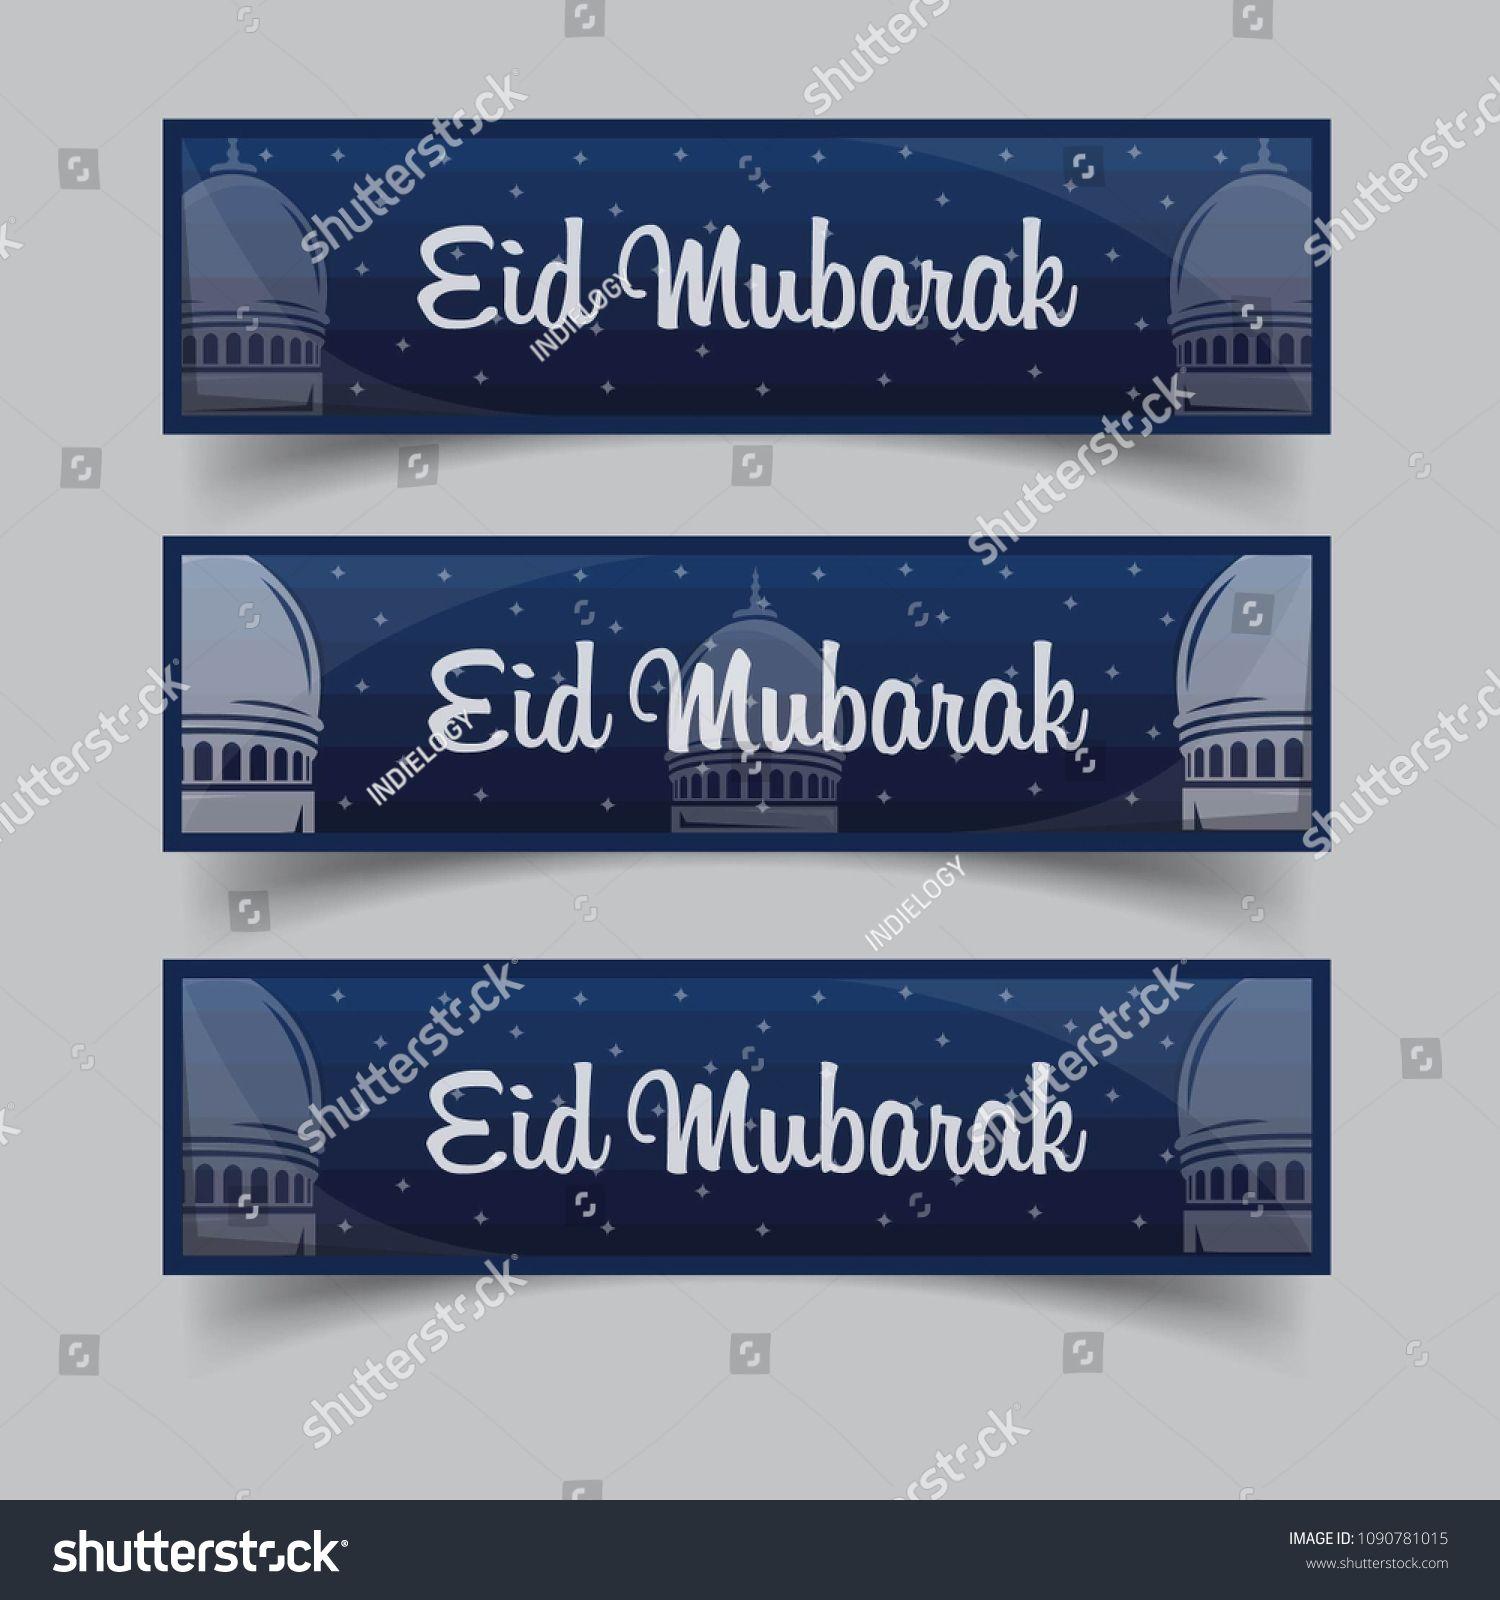 Set Of Banners Template With Islamic Design Greeting Eid Mubarak